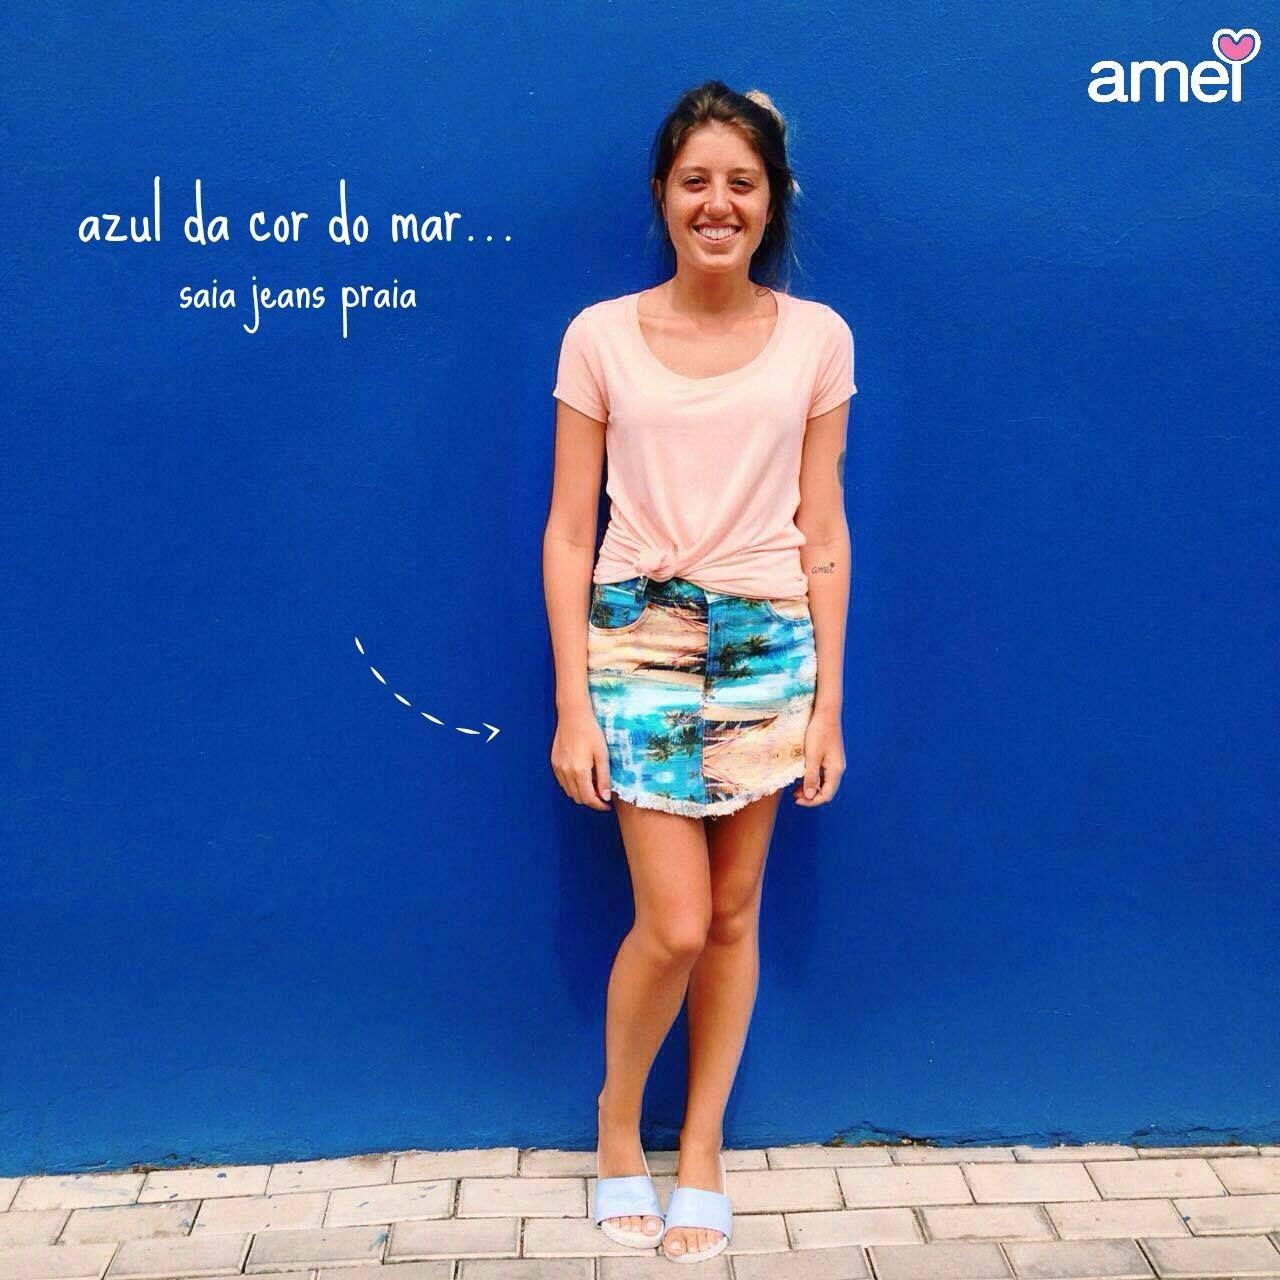 Azul infinito 🌊🌴 #lojaamei #azulbic #parede #praia #mar #chinelo #ferias